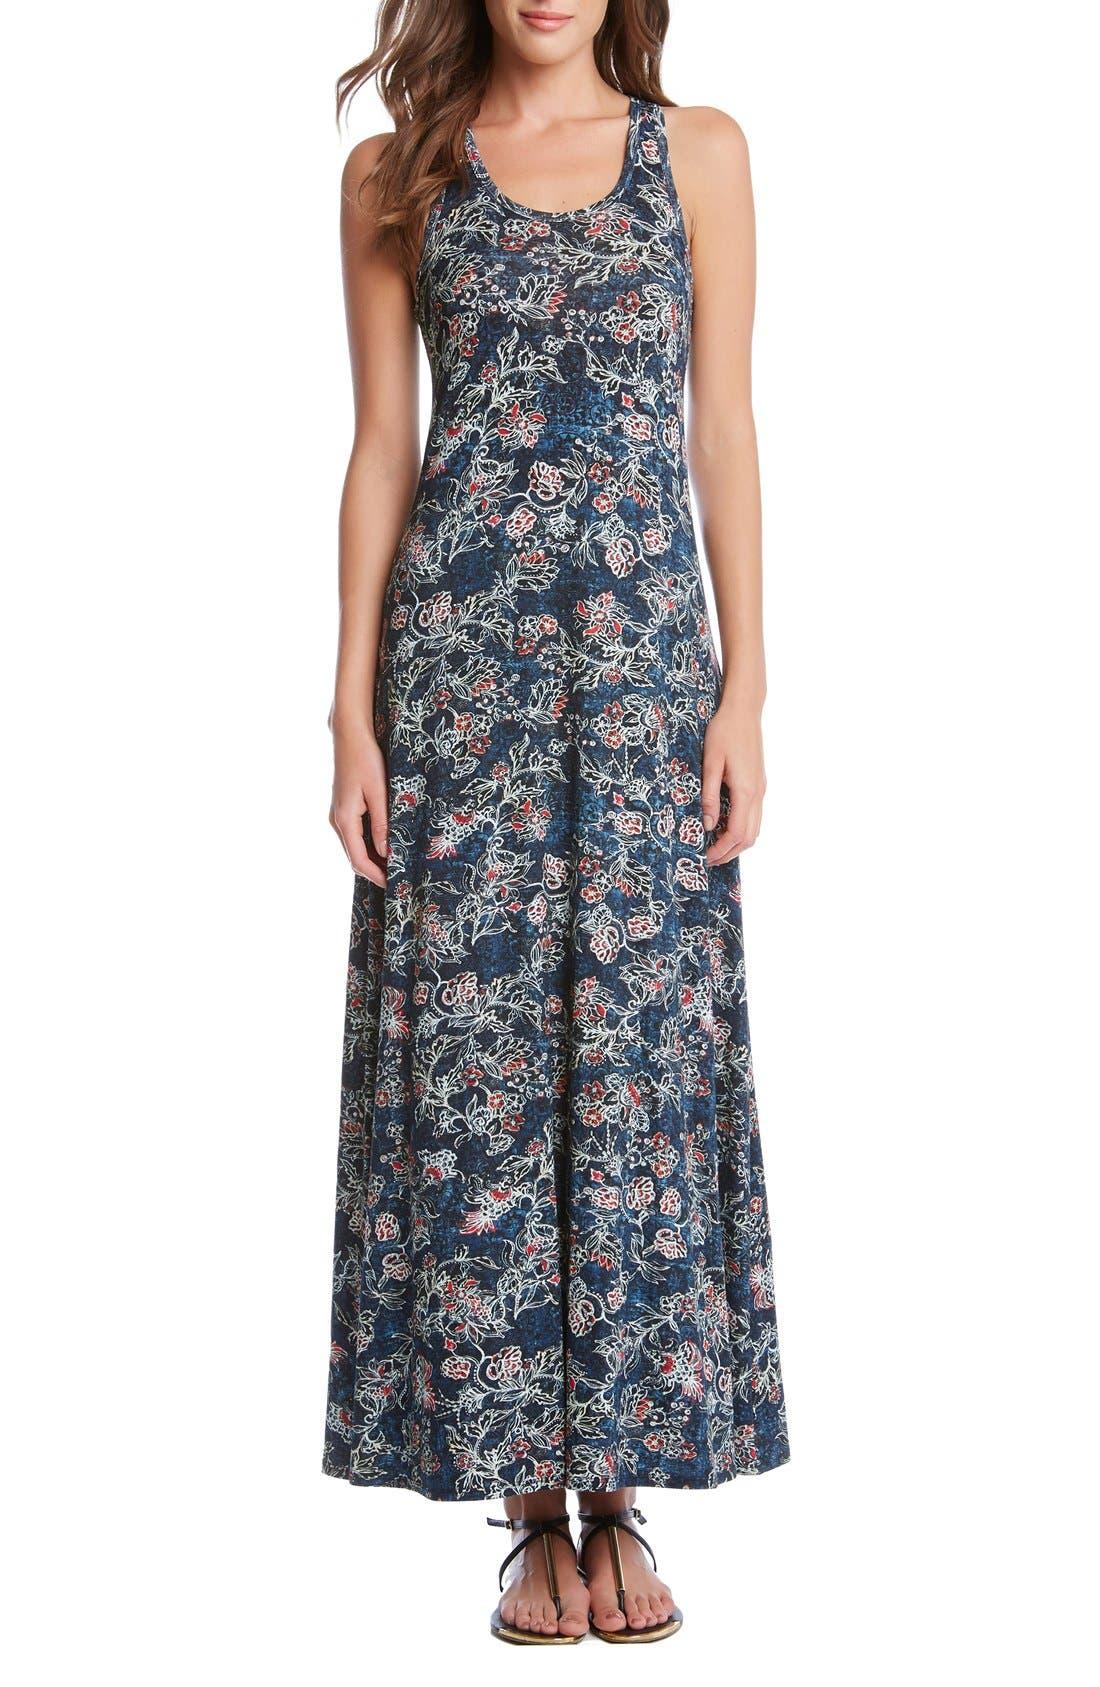 Alternate Image 1 Selected - Karen Kane 'Tasha' Batik Floral Print Jersey Maxi Dress